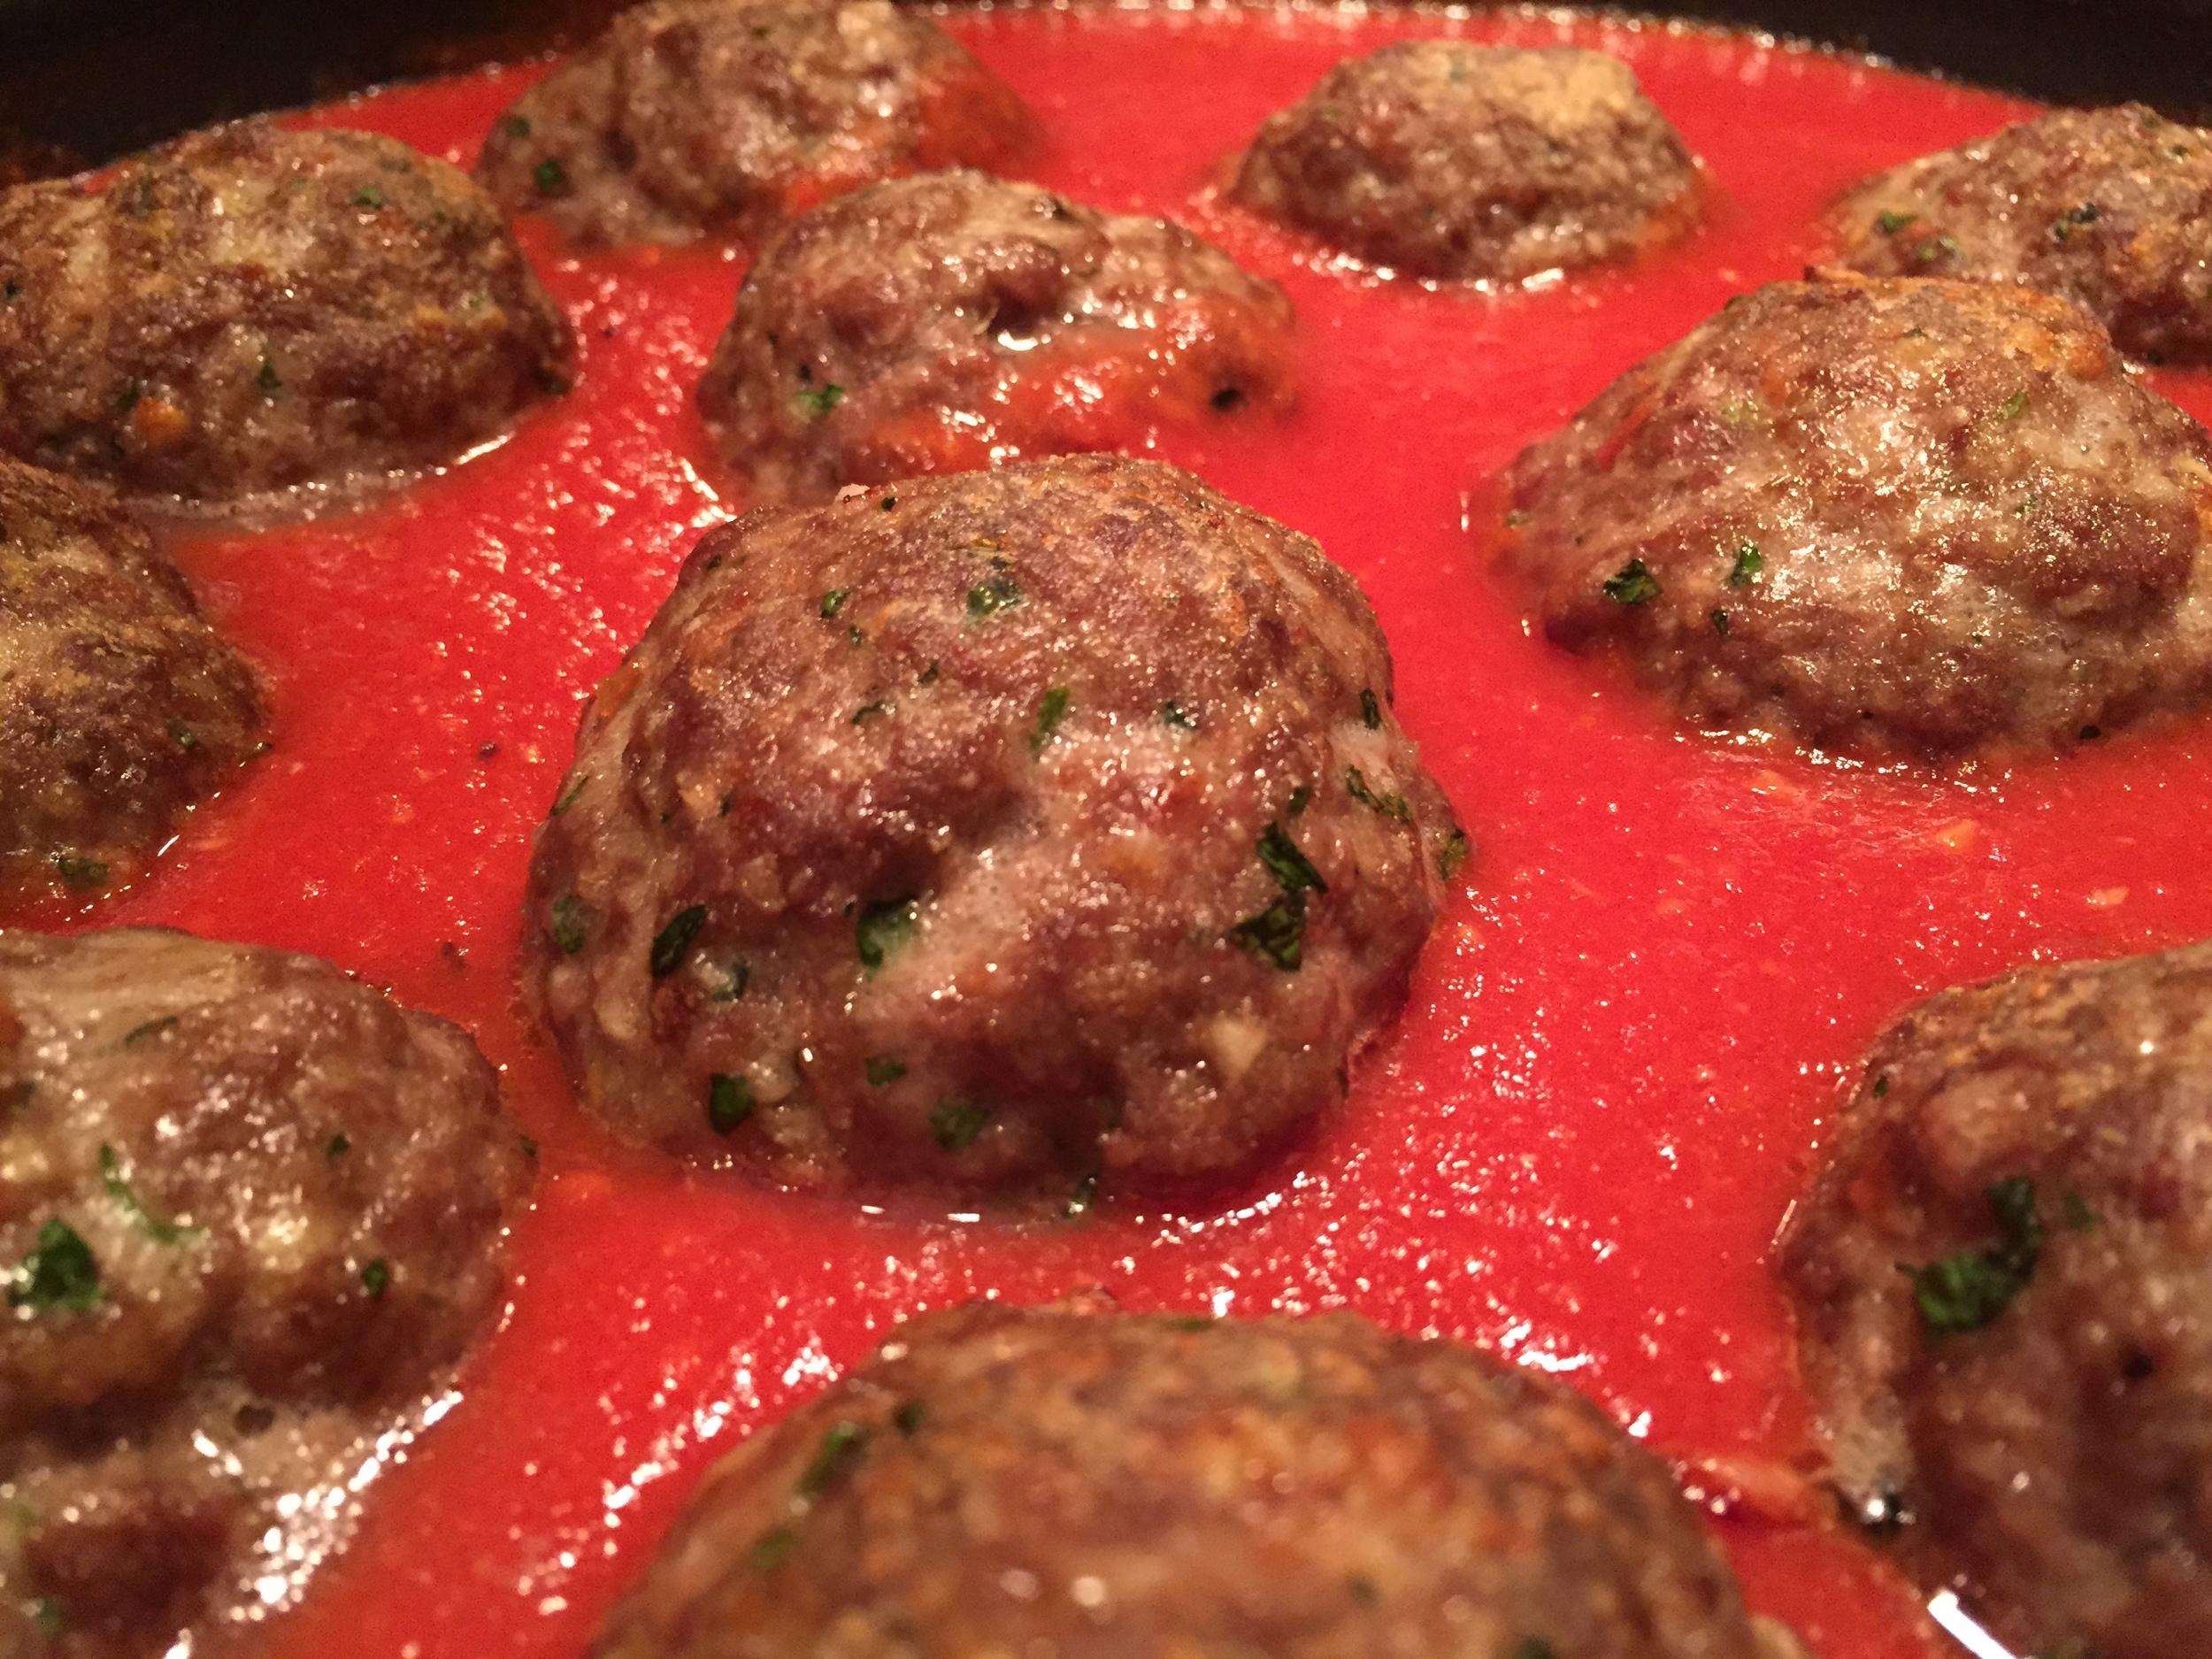 Chef Jake's Meatballs